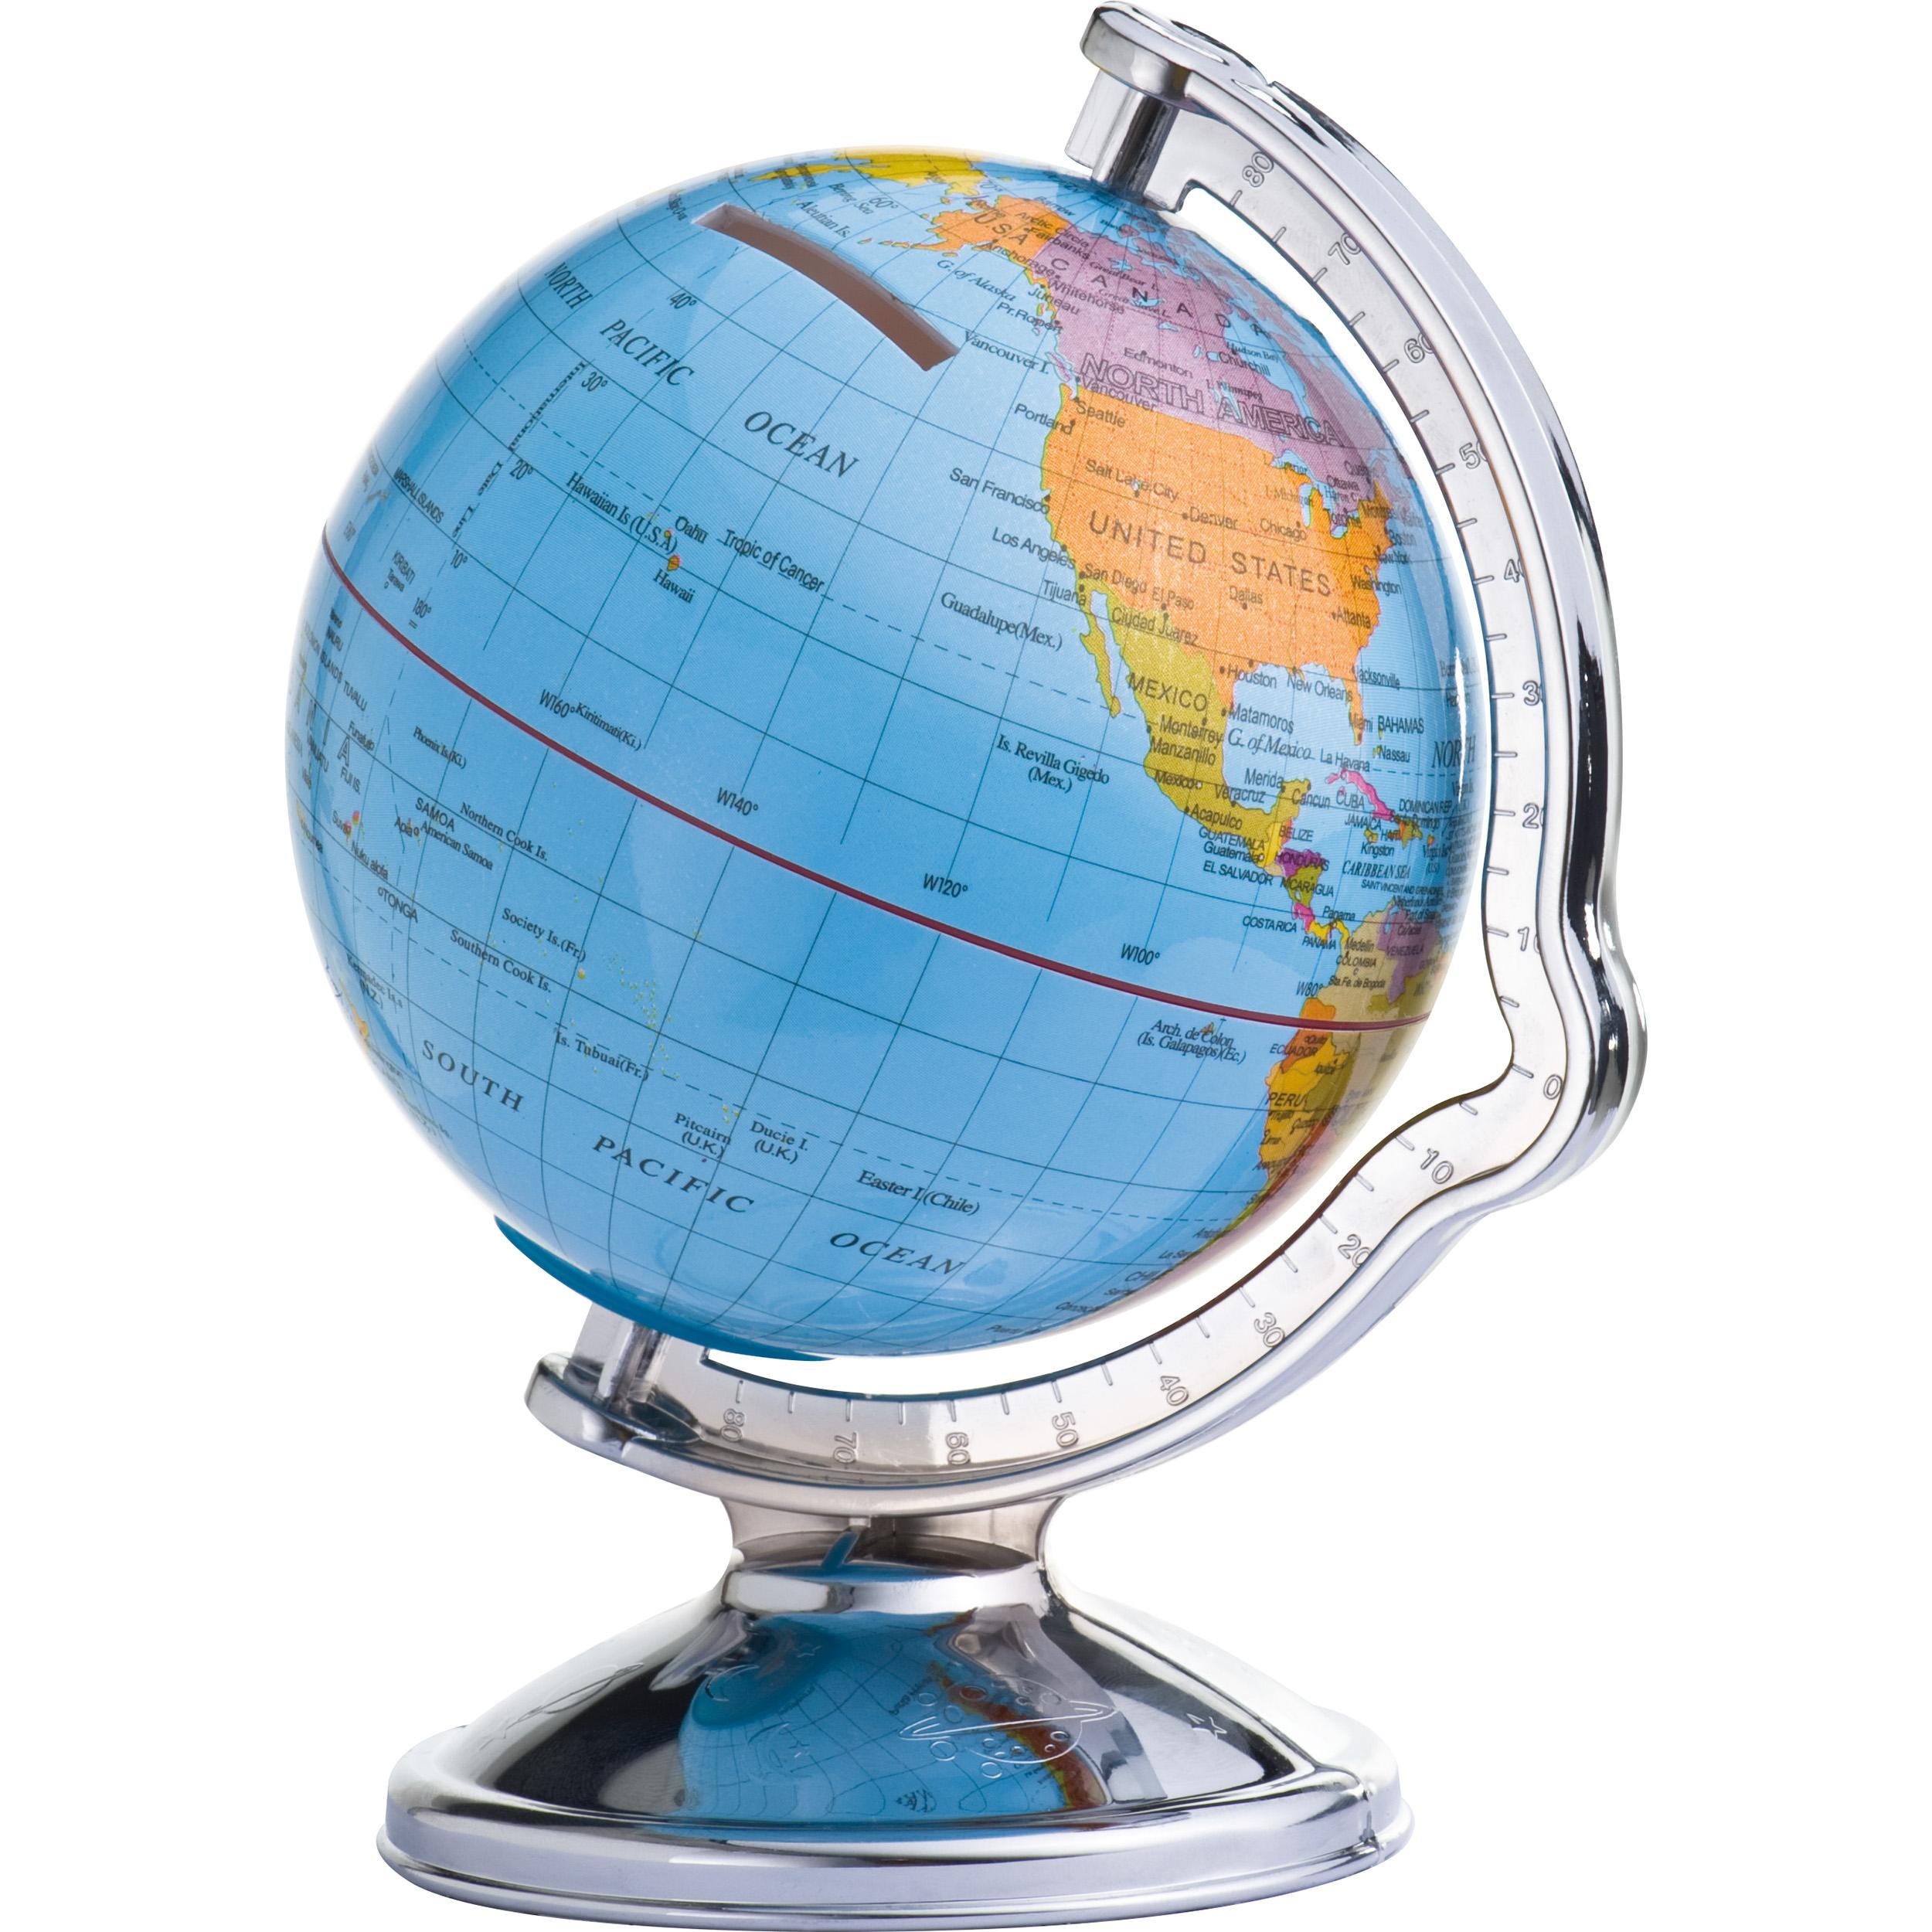 Savings box in globe shape